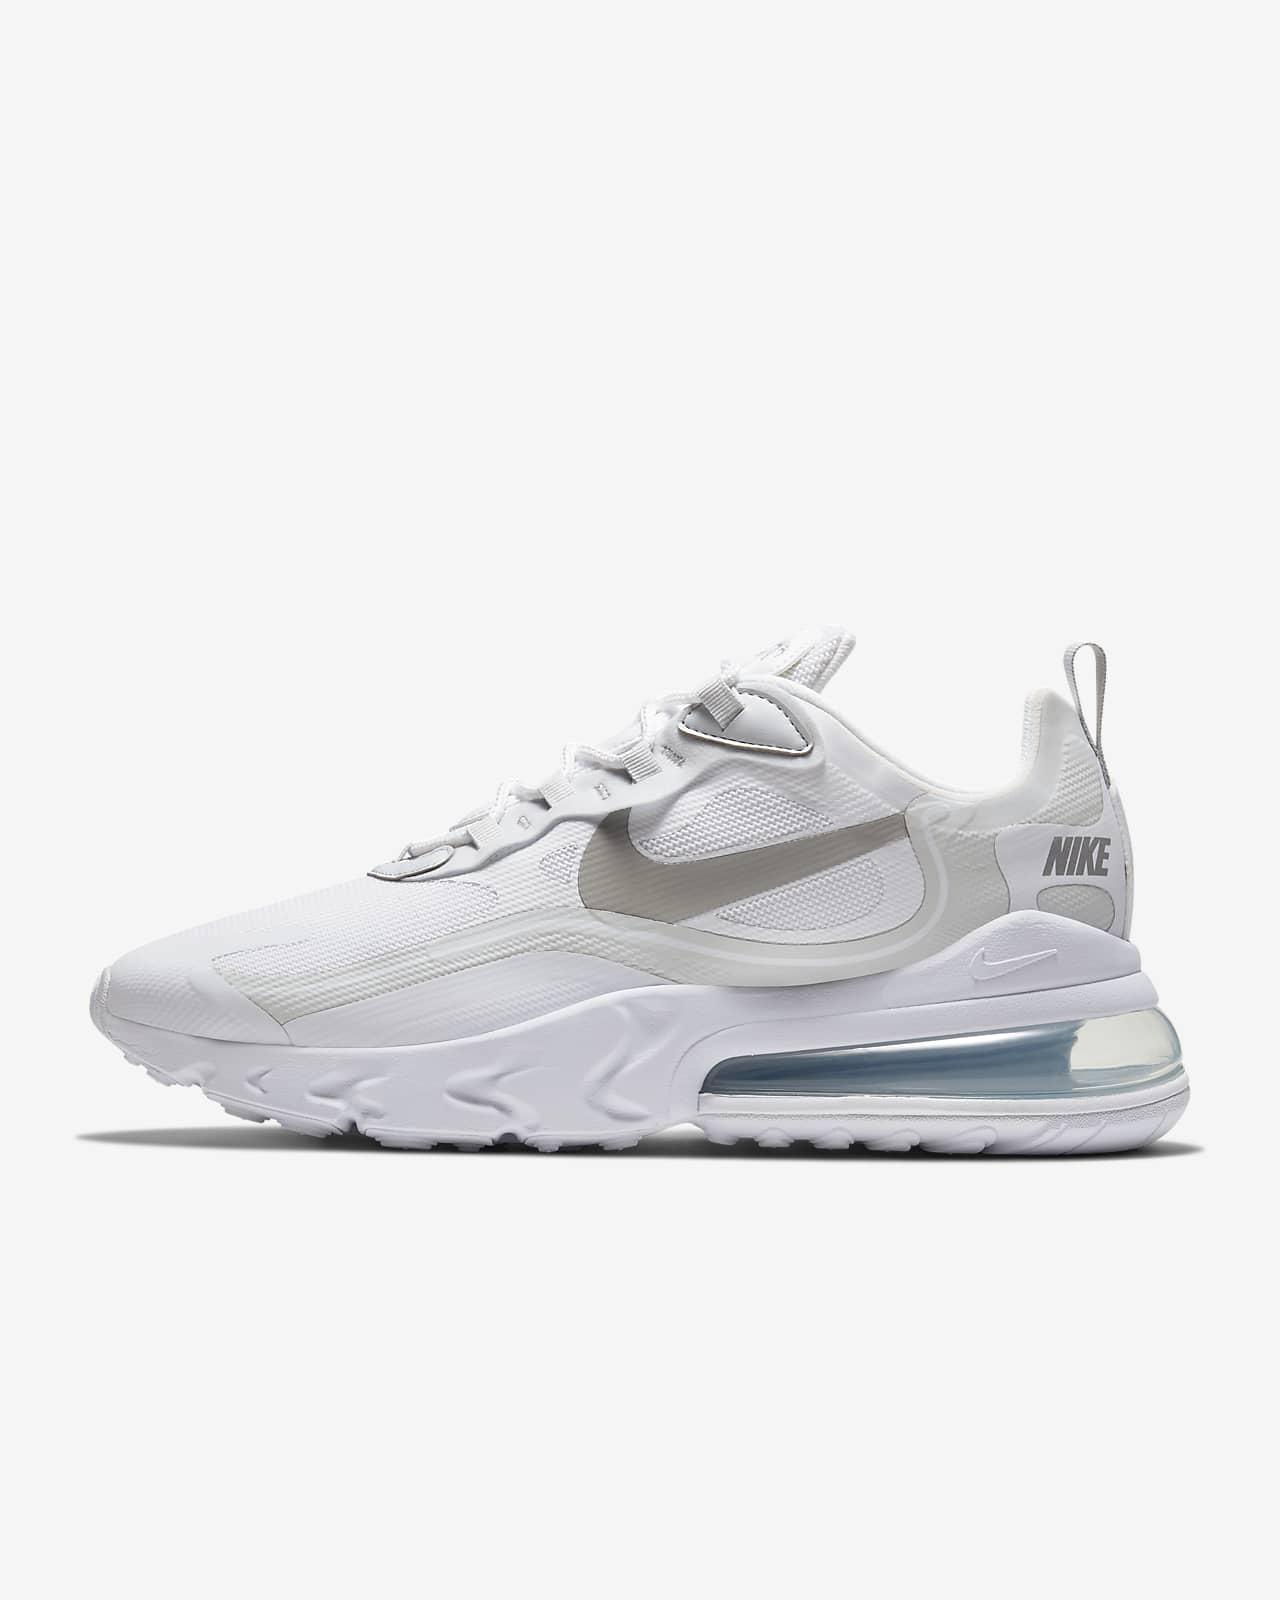 Nike Air Max 270 React Men's Shoe. Nike NL